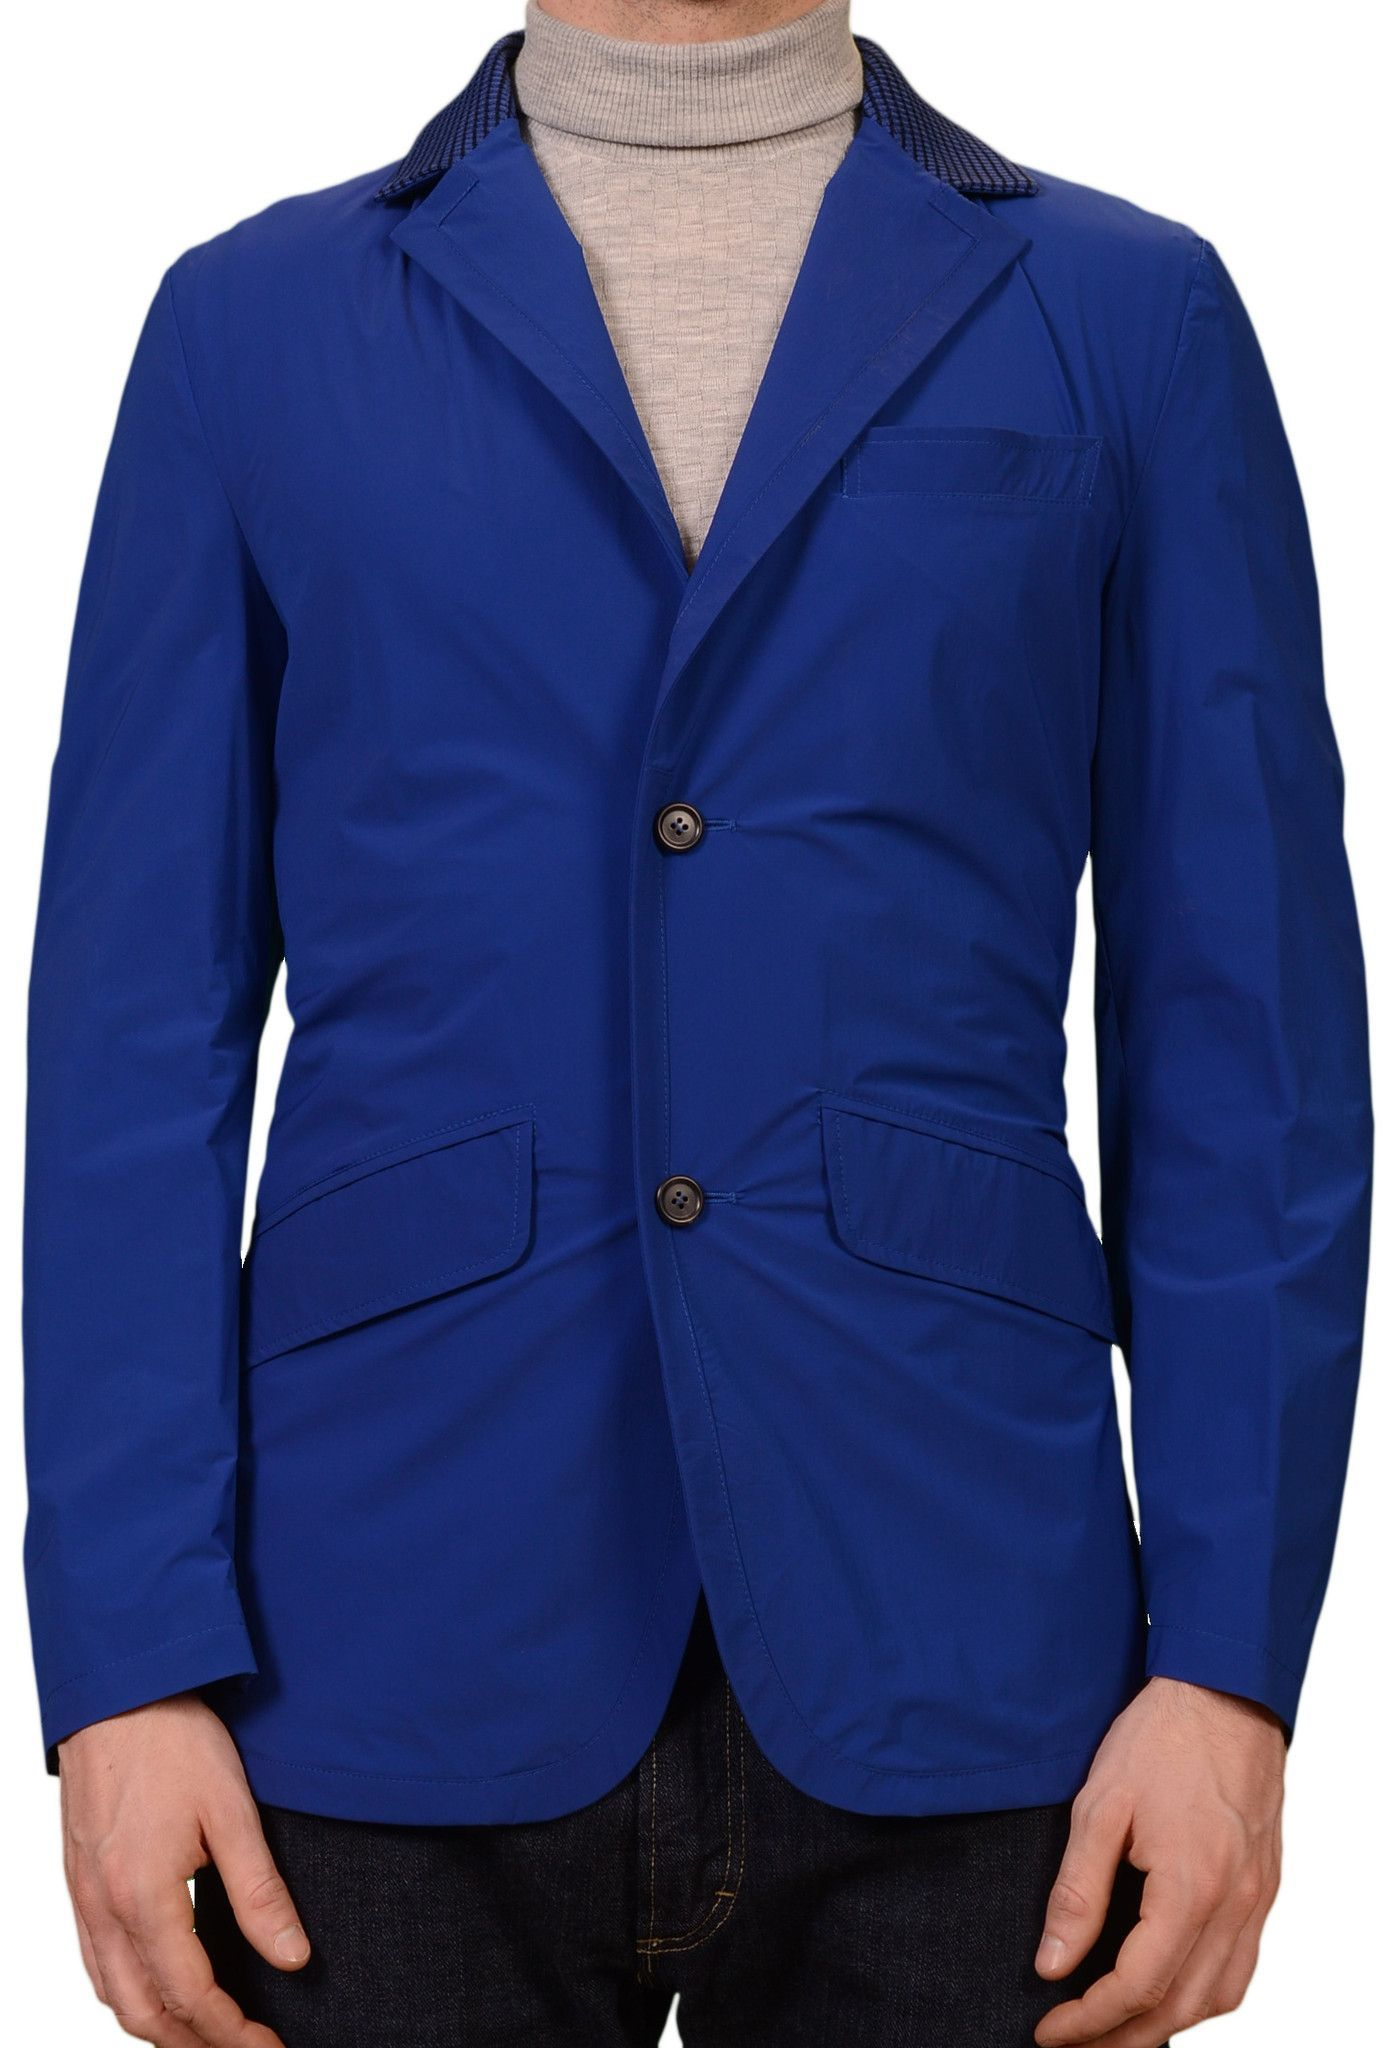 K. Punto Rosso by KITON Napoli Blue Spring Jacket Blazer EU 50 NEW US 40